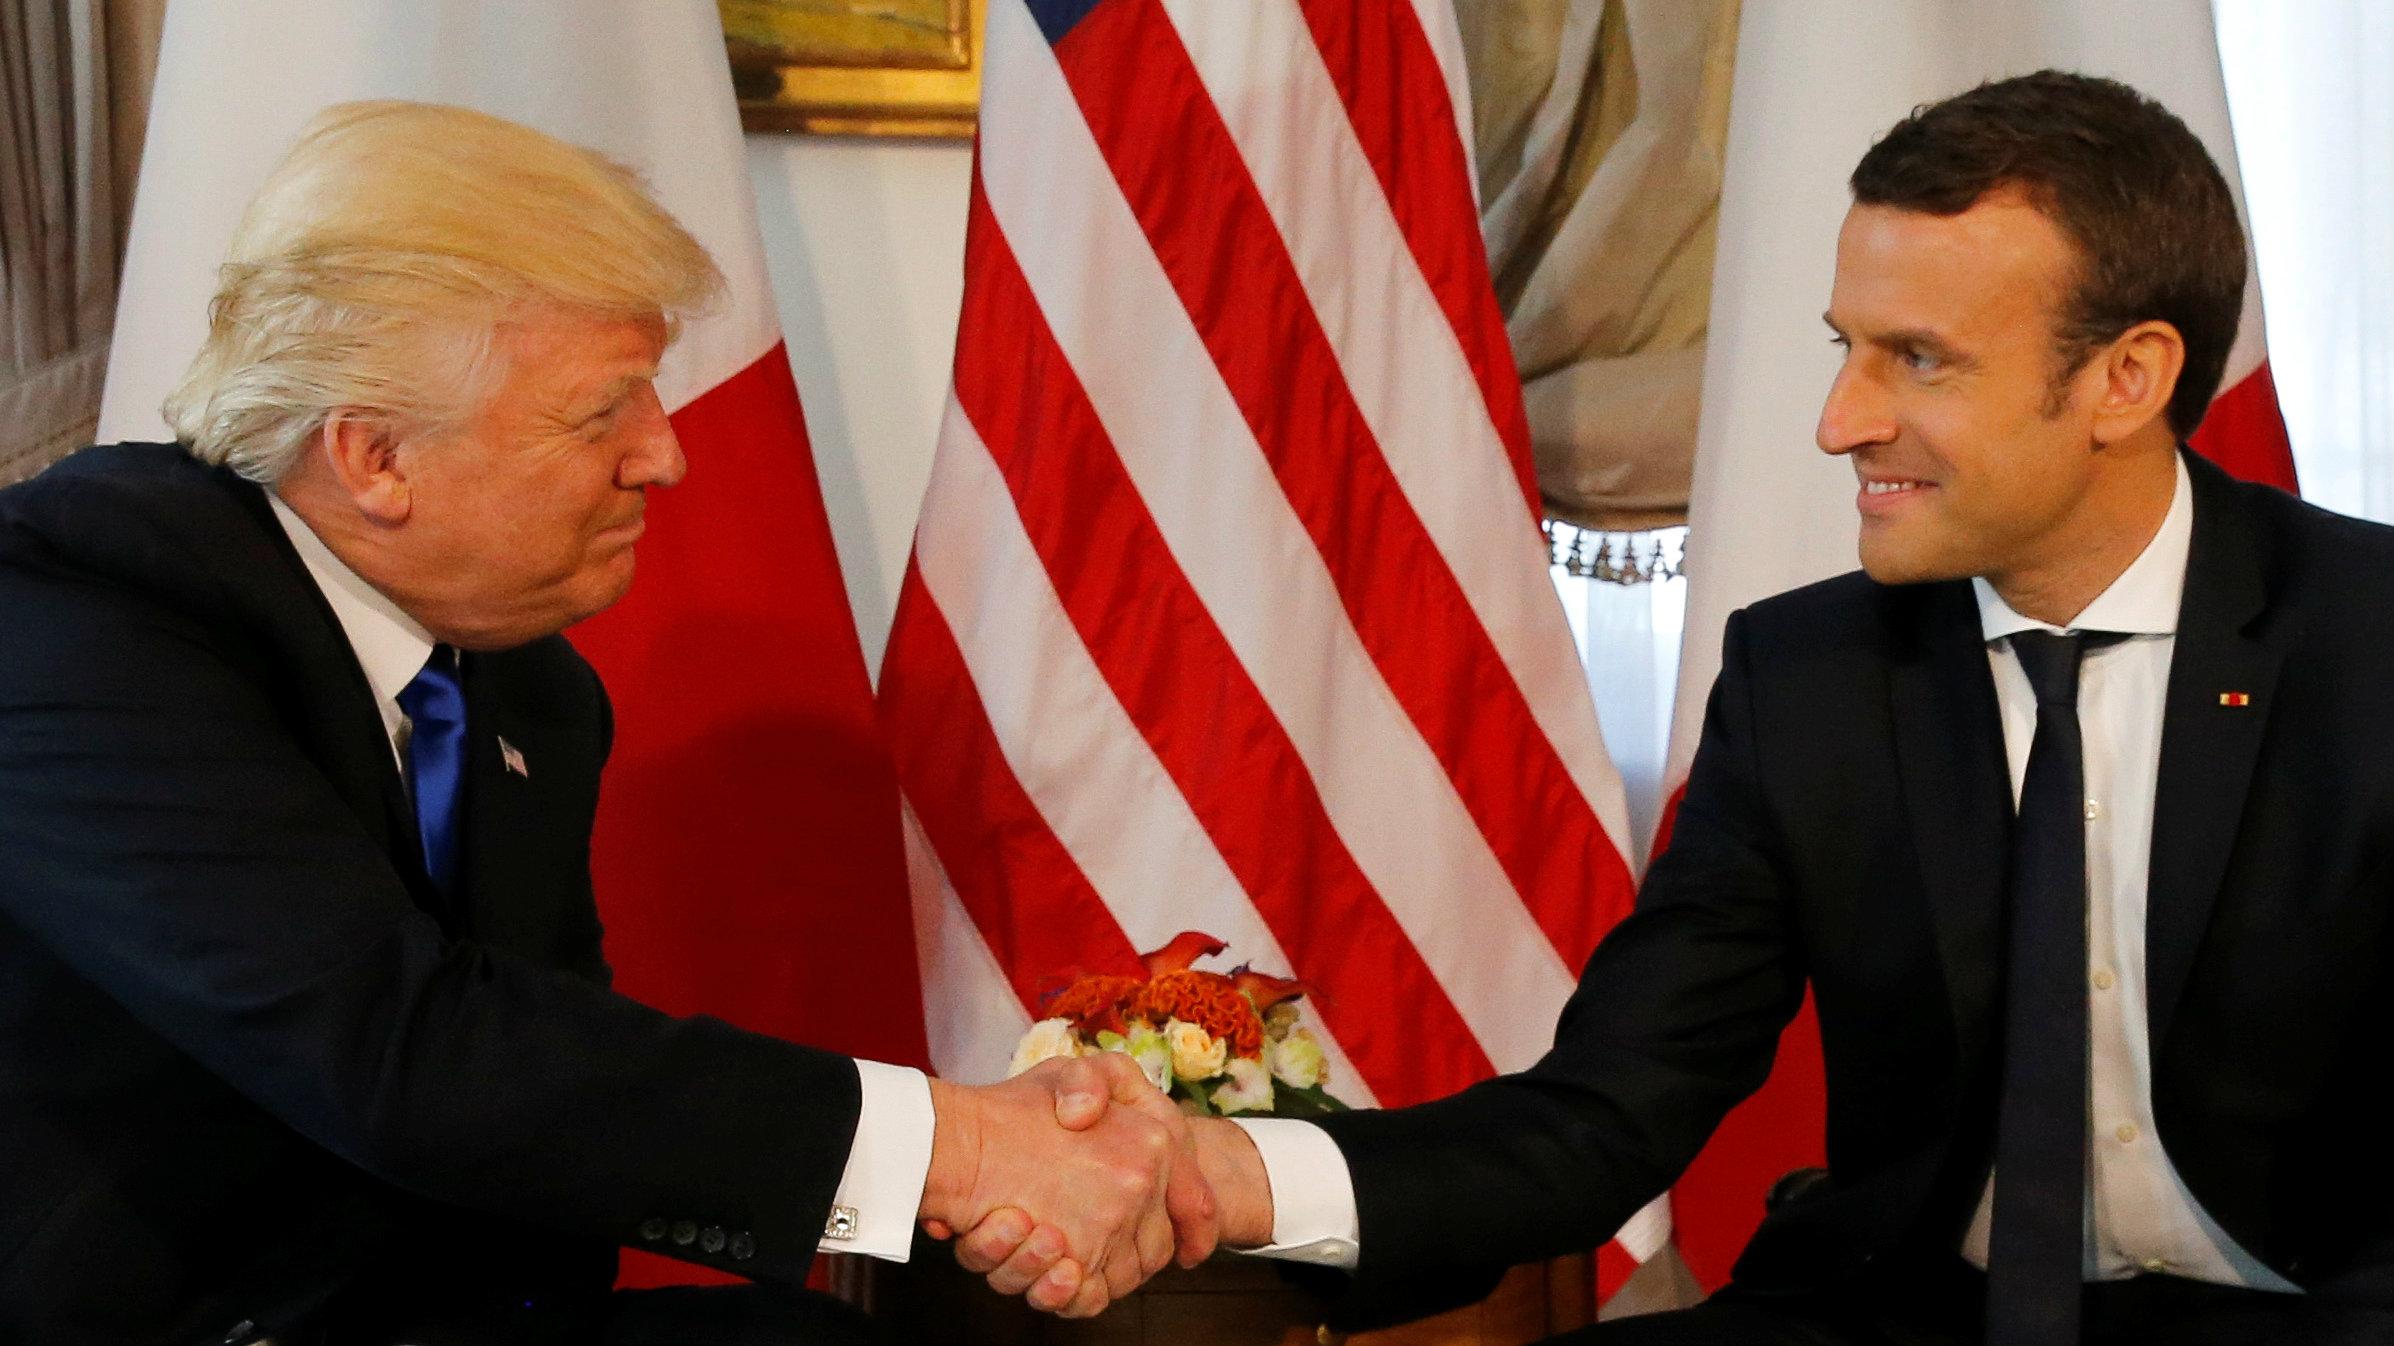 Emmanuel Macron Beats Donald Trump According To This Gauge Of Stock Market Investor Enthusiasm Quartz